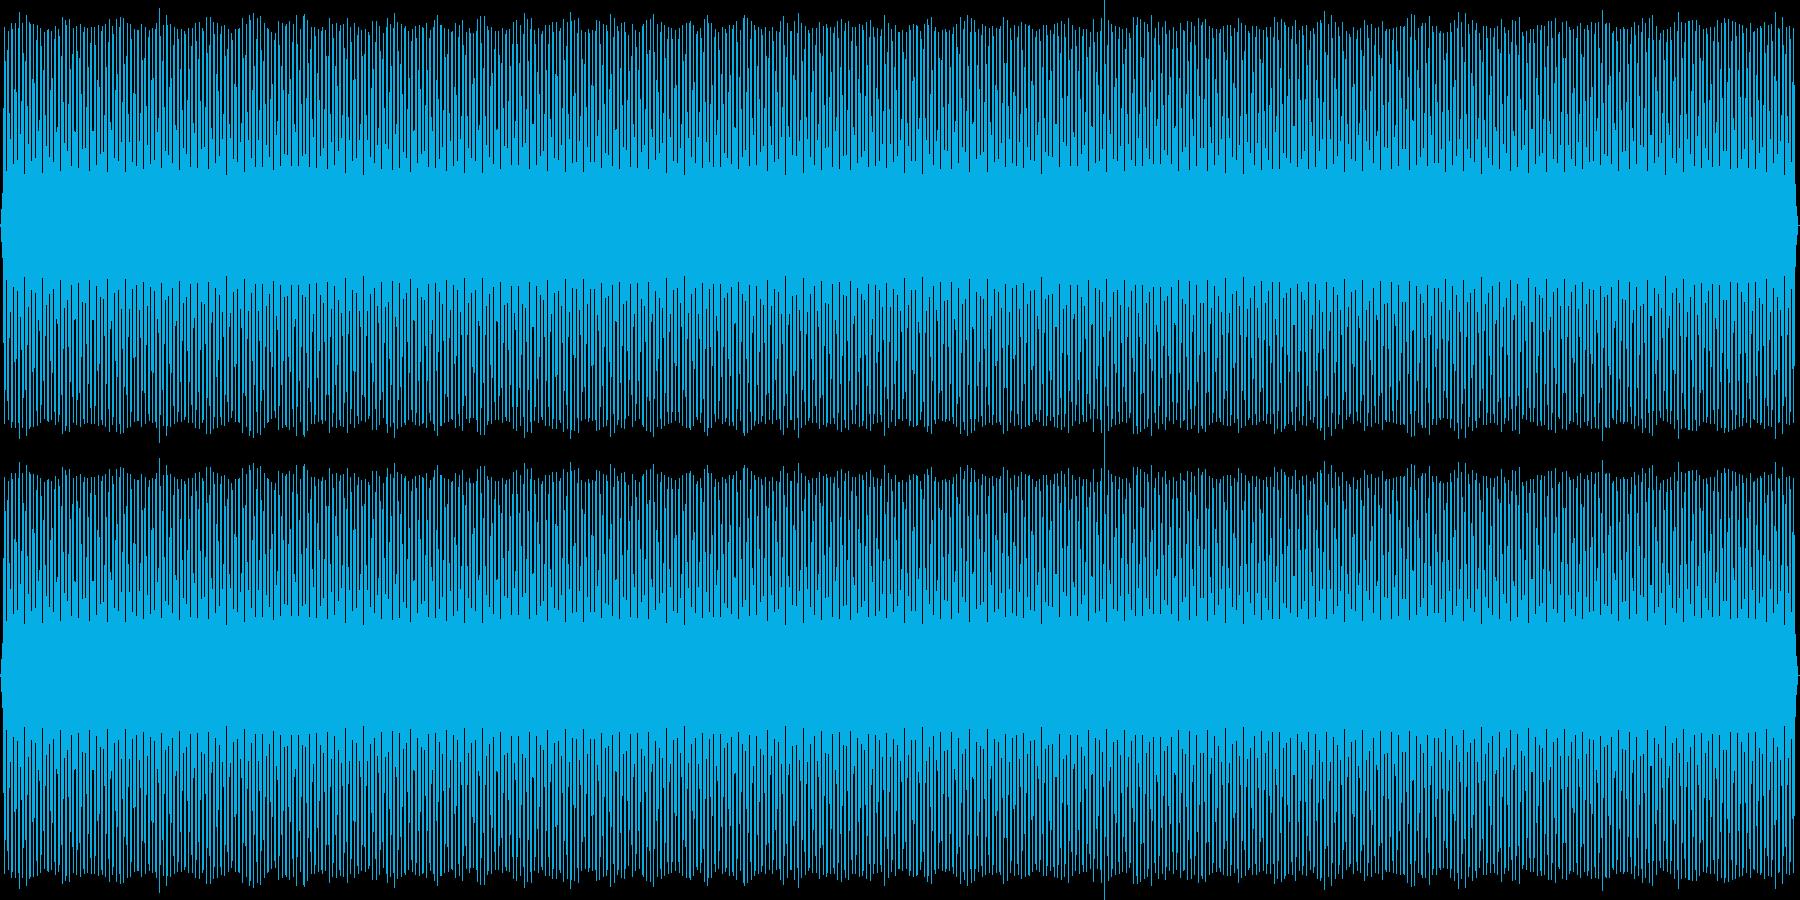 SFチックな背景音(レトロゲーム風)の再生済みの波形